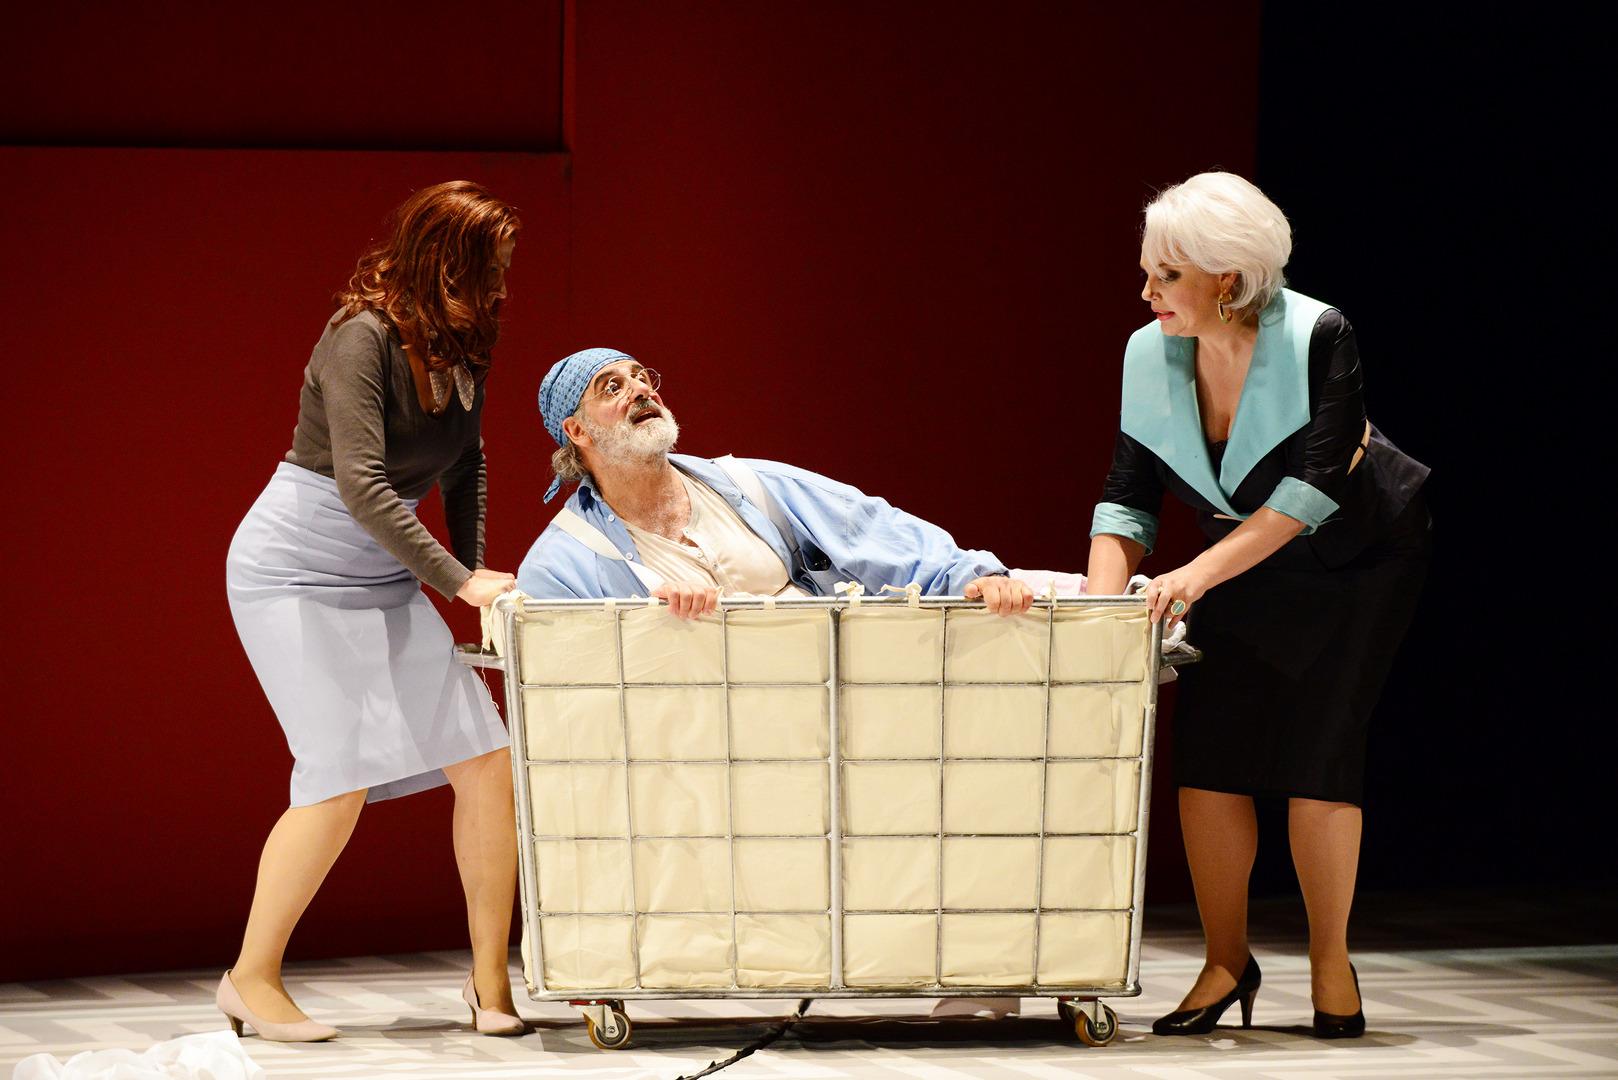 Falstaff-Opera-by-Giuseppe-Verdi-directed-by-Jacopo-Spirei- in-Karlsruhe-7